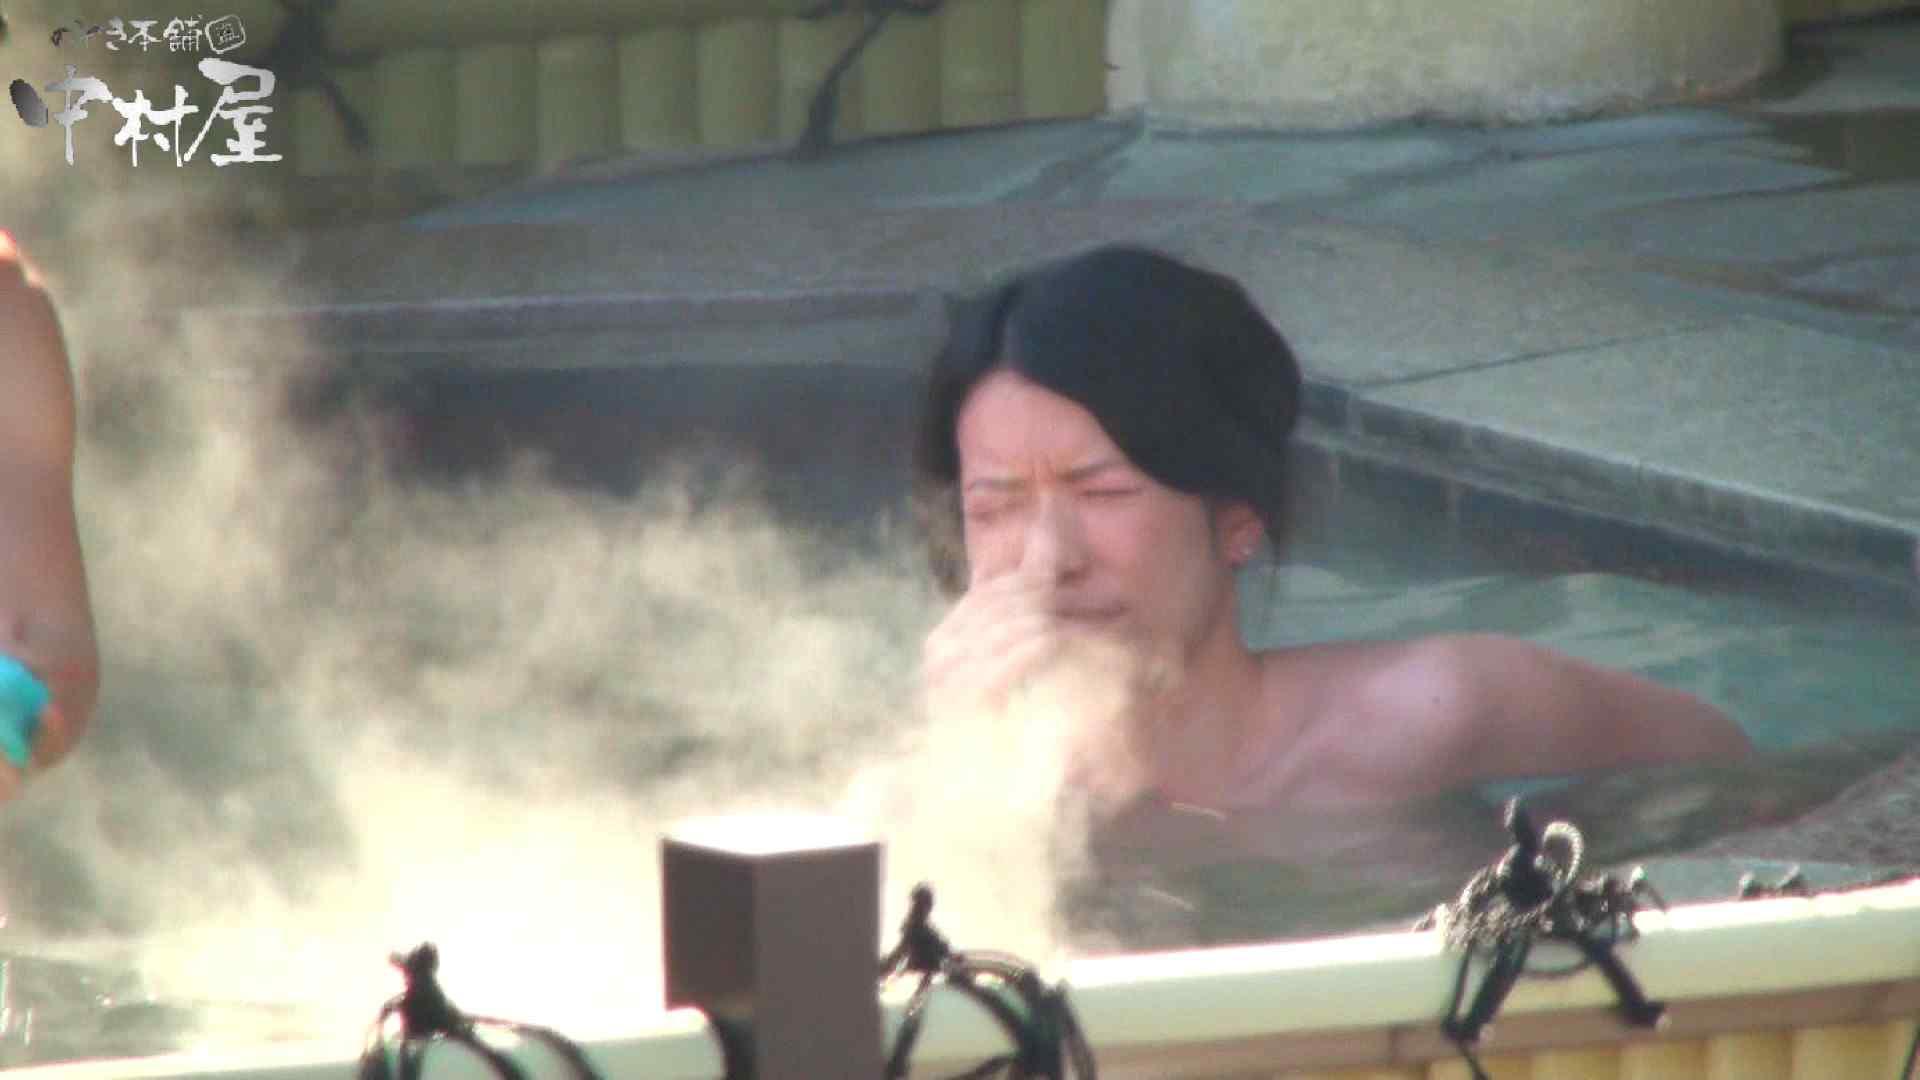 Aquaな露天風呂Vol.919 OLのエロ生活   露天風呂  91連発 61